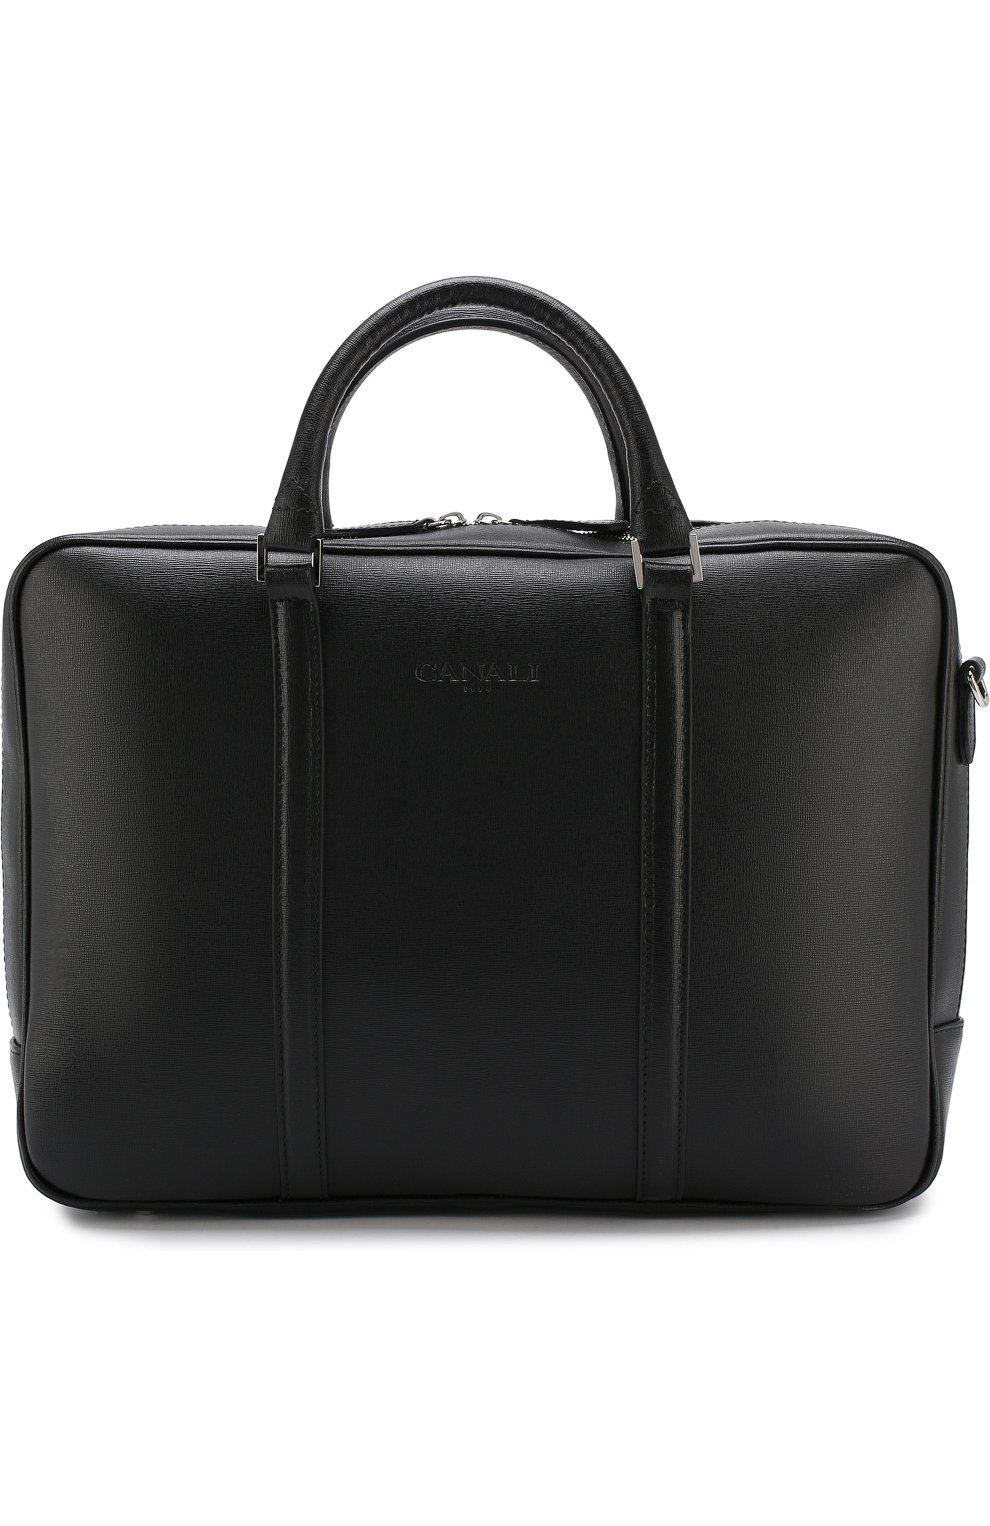 5d6a66a83658 Мужская черная кожаная сумка для ноутбука с плечевым ремнем CANALI ...